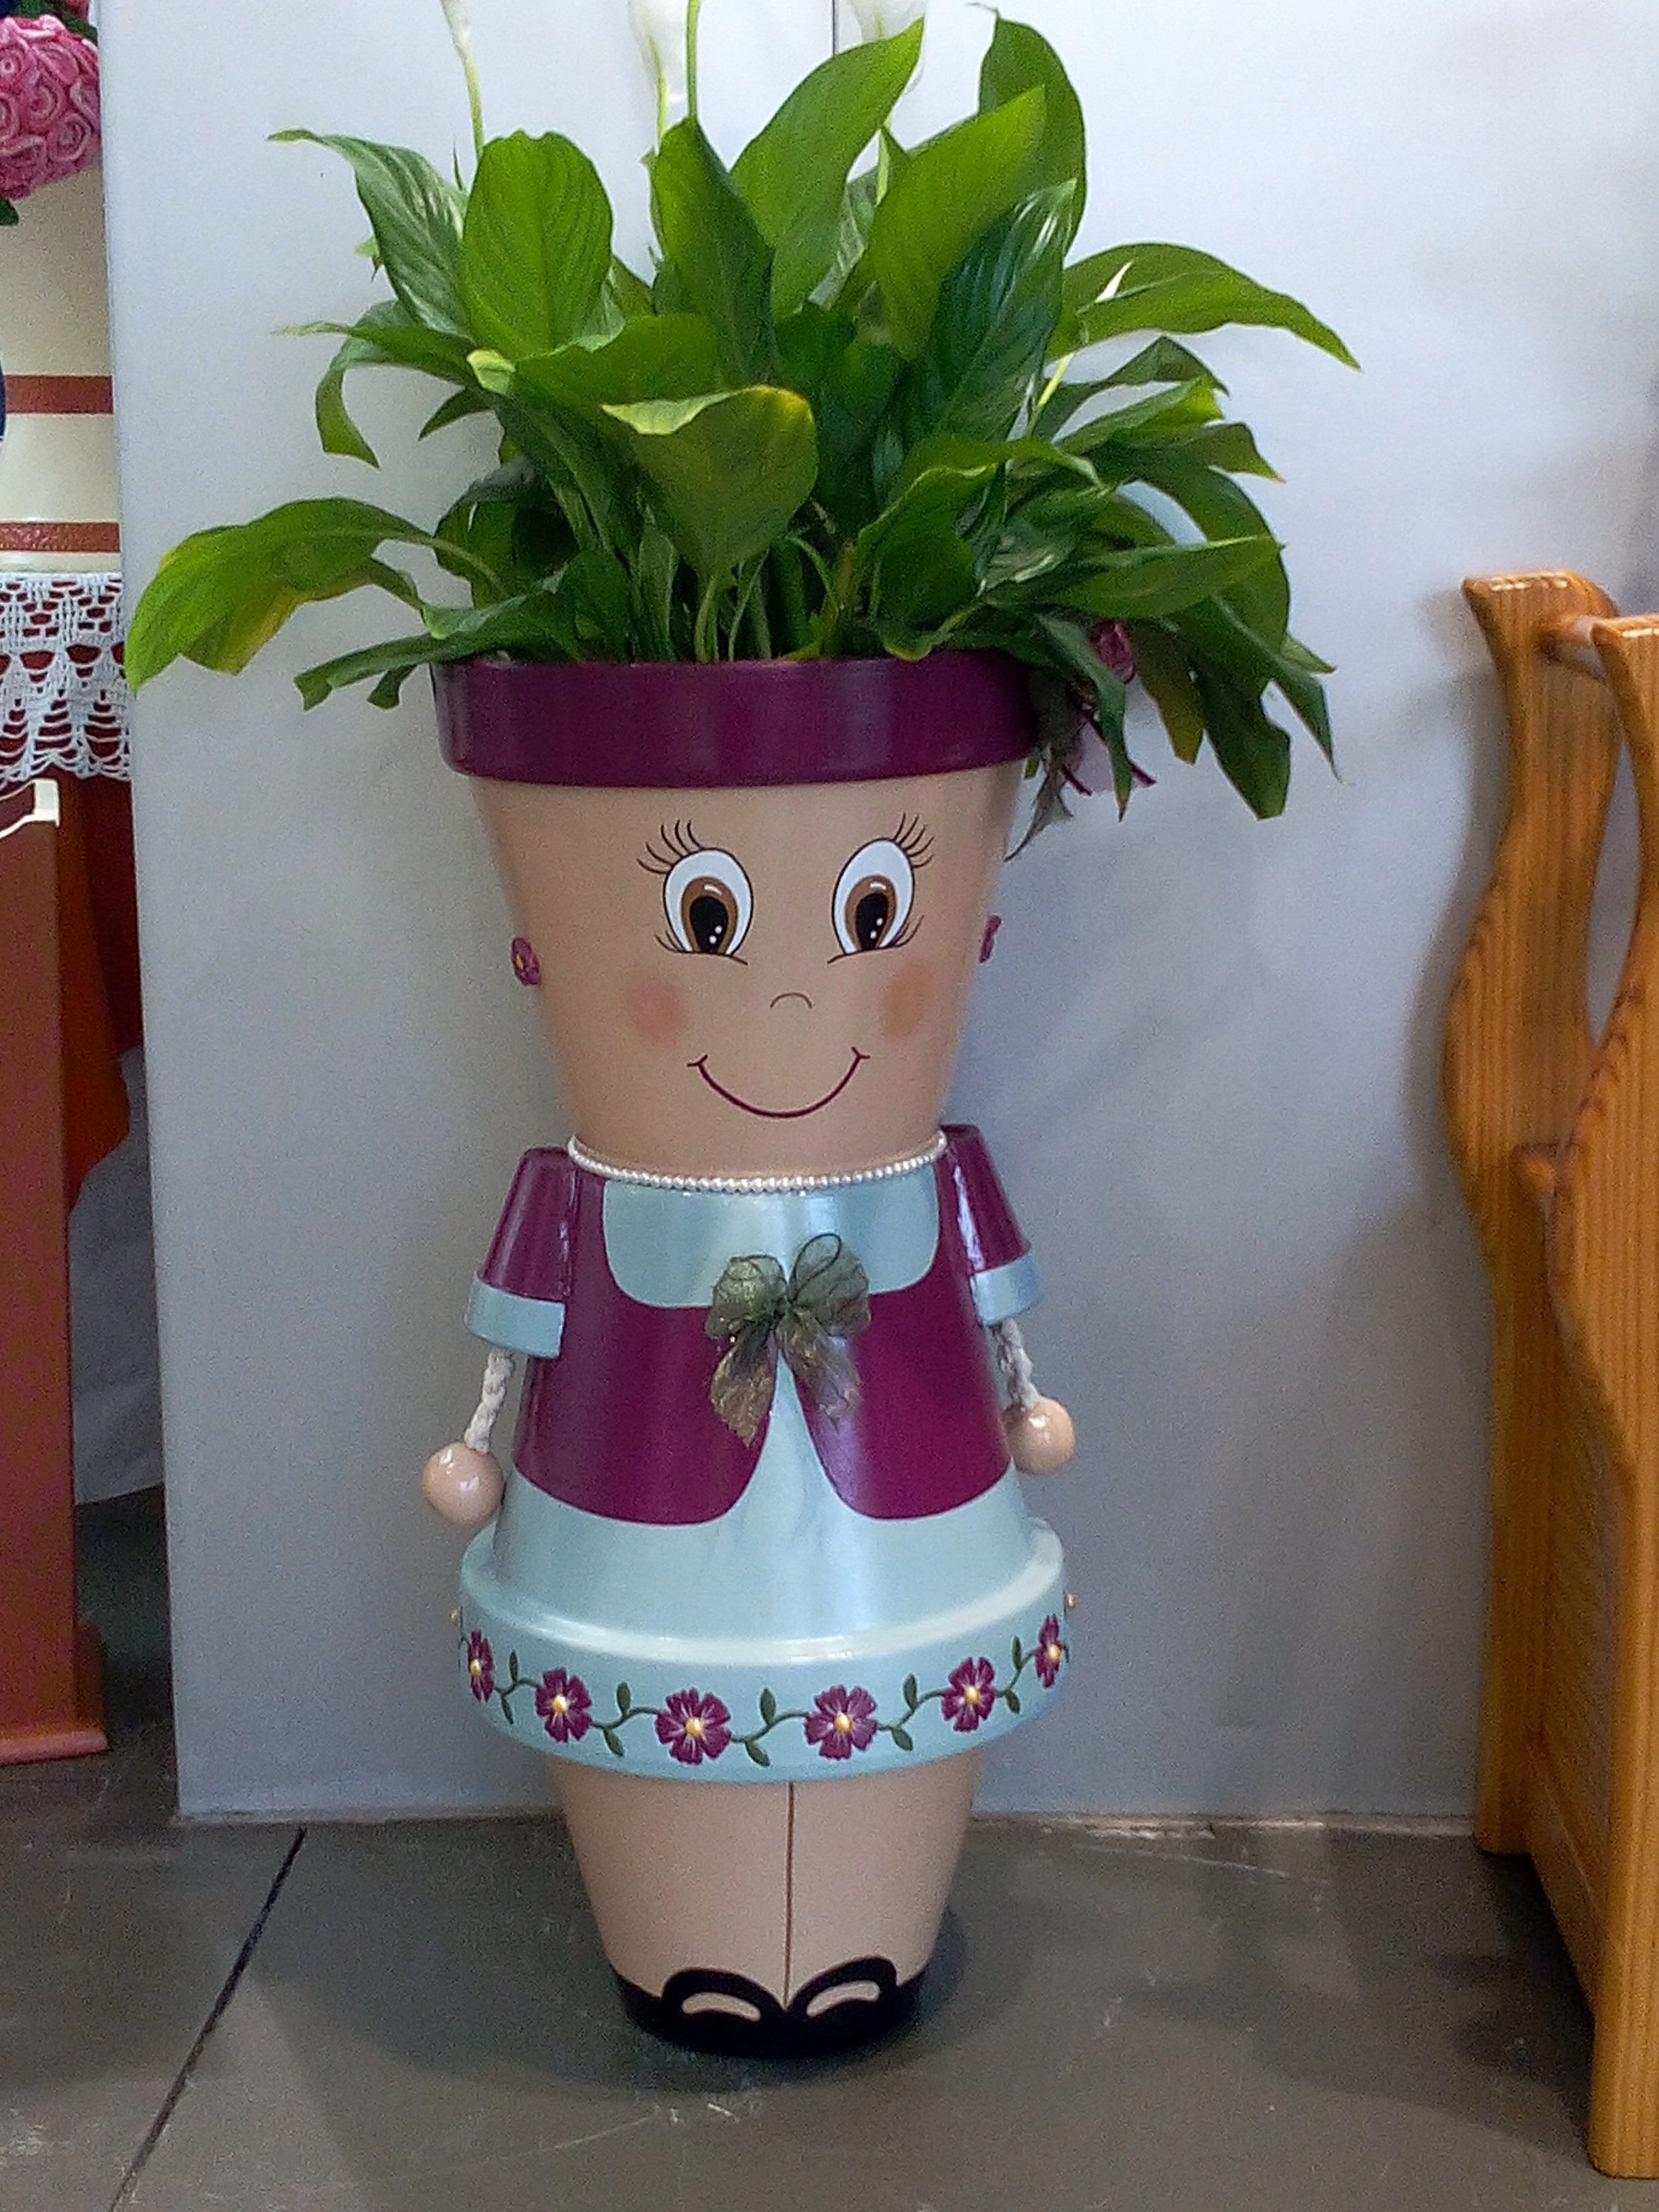 Diy Flower Pots Beautiful Cheap Neat Gardening In 2020 Clay Pot Crafts Painted Flower Pots Terra Cotta Pot Crafts